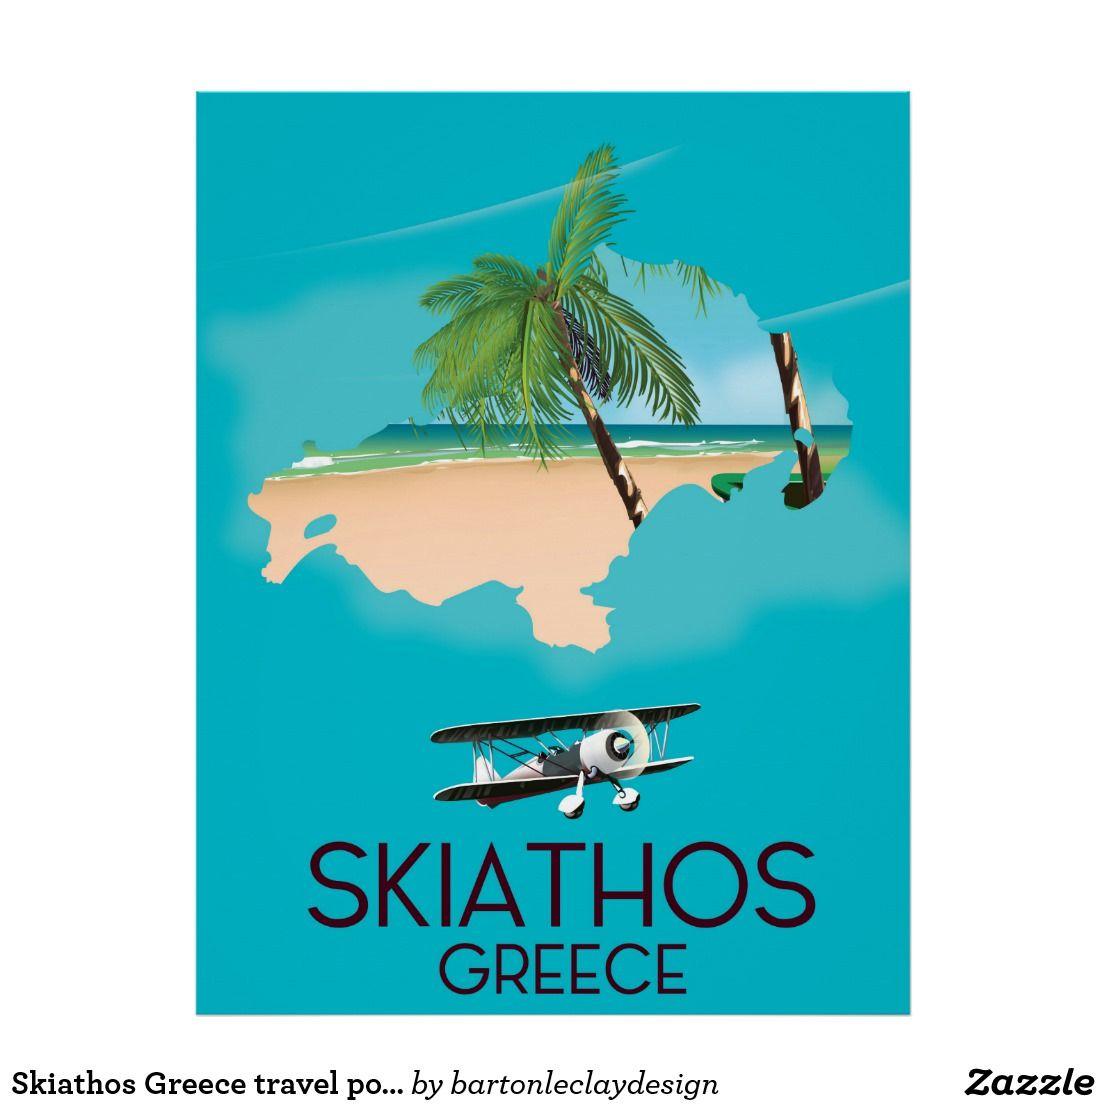 Skiathos Greece Travel Poster Zazzle Com In 2020 Greece Travel Skiathos Greece Travel Posters